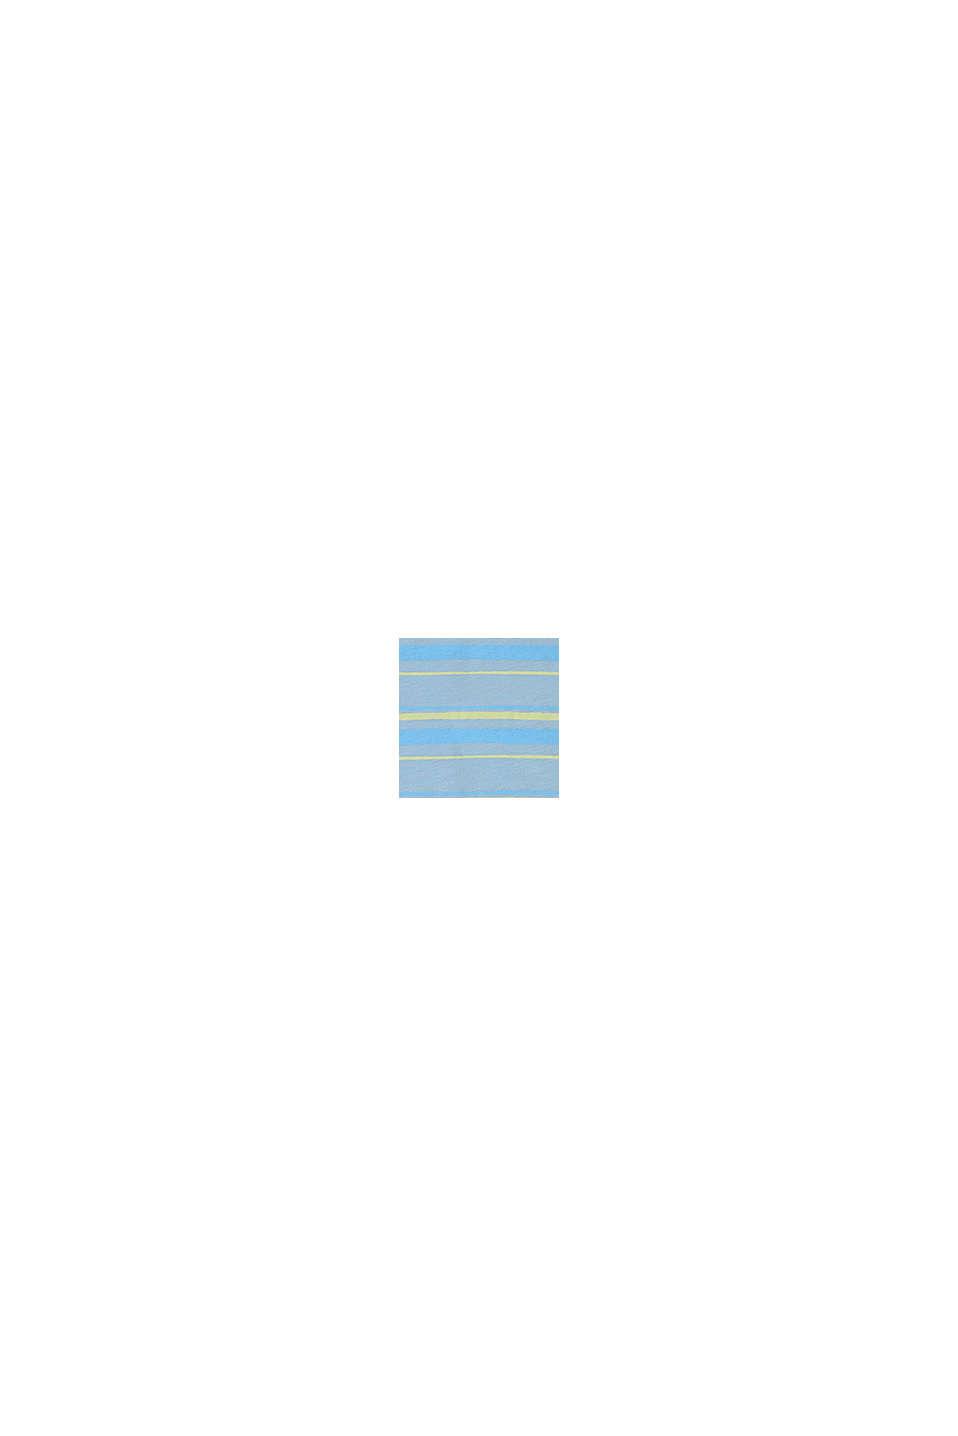 Gestreepte jersey jurk van 100% katoen, BLUE LAVENDER, swatch